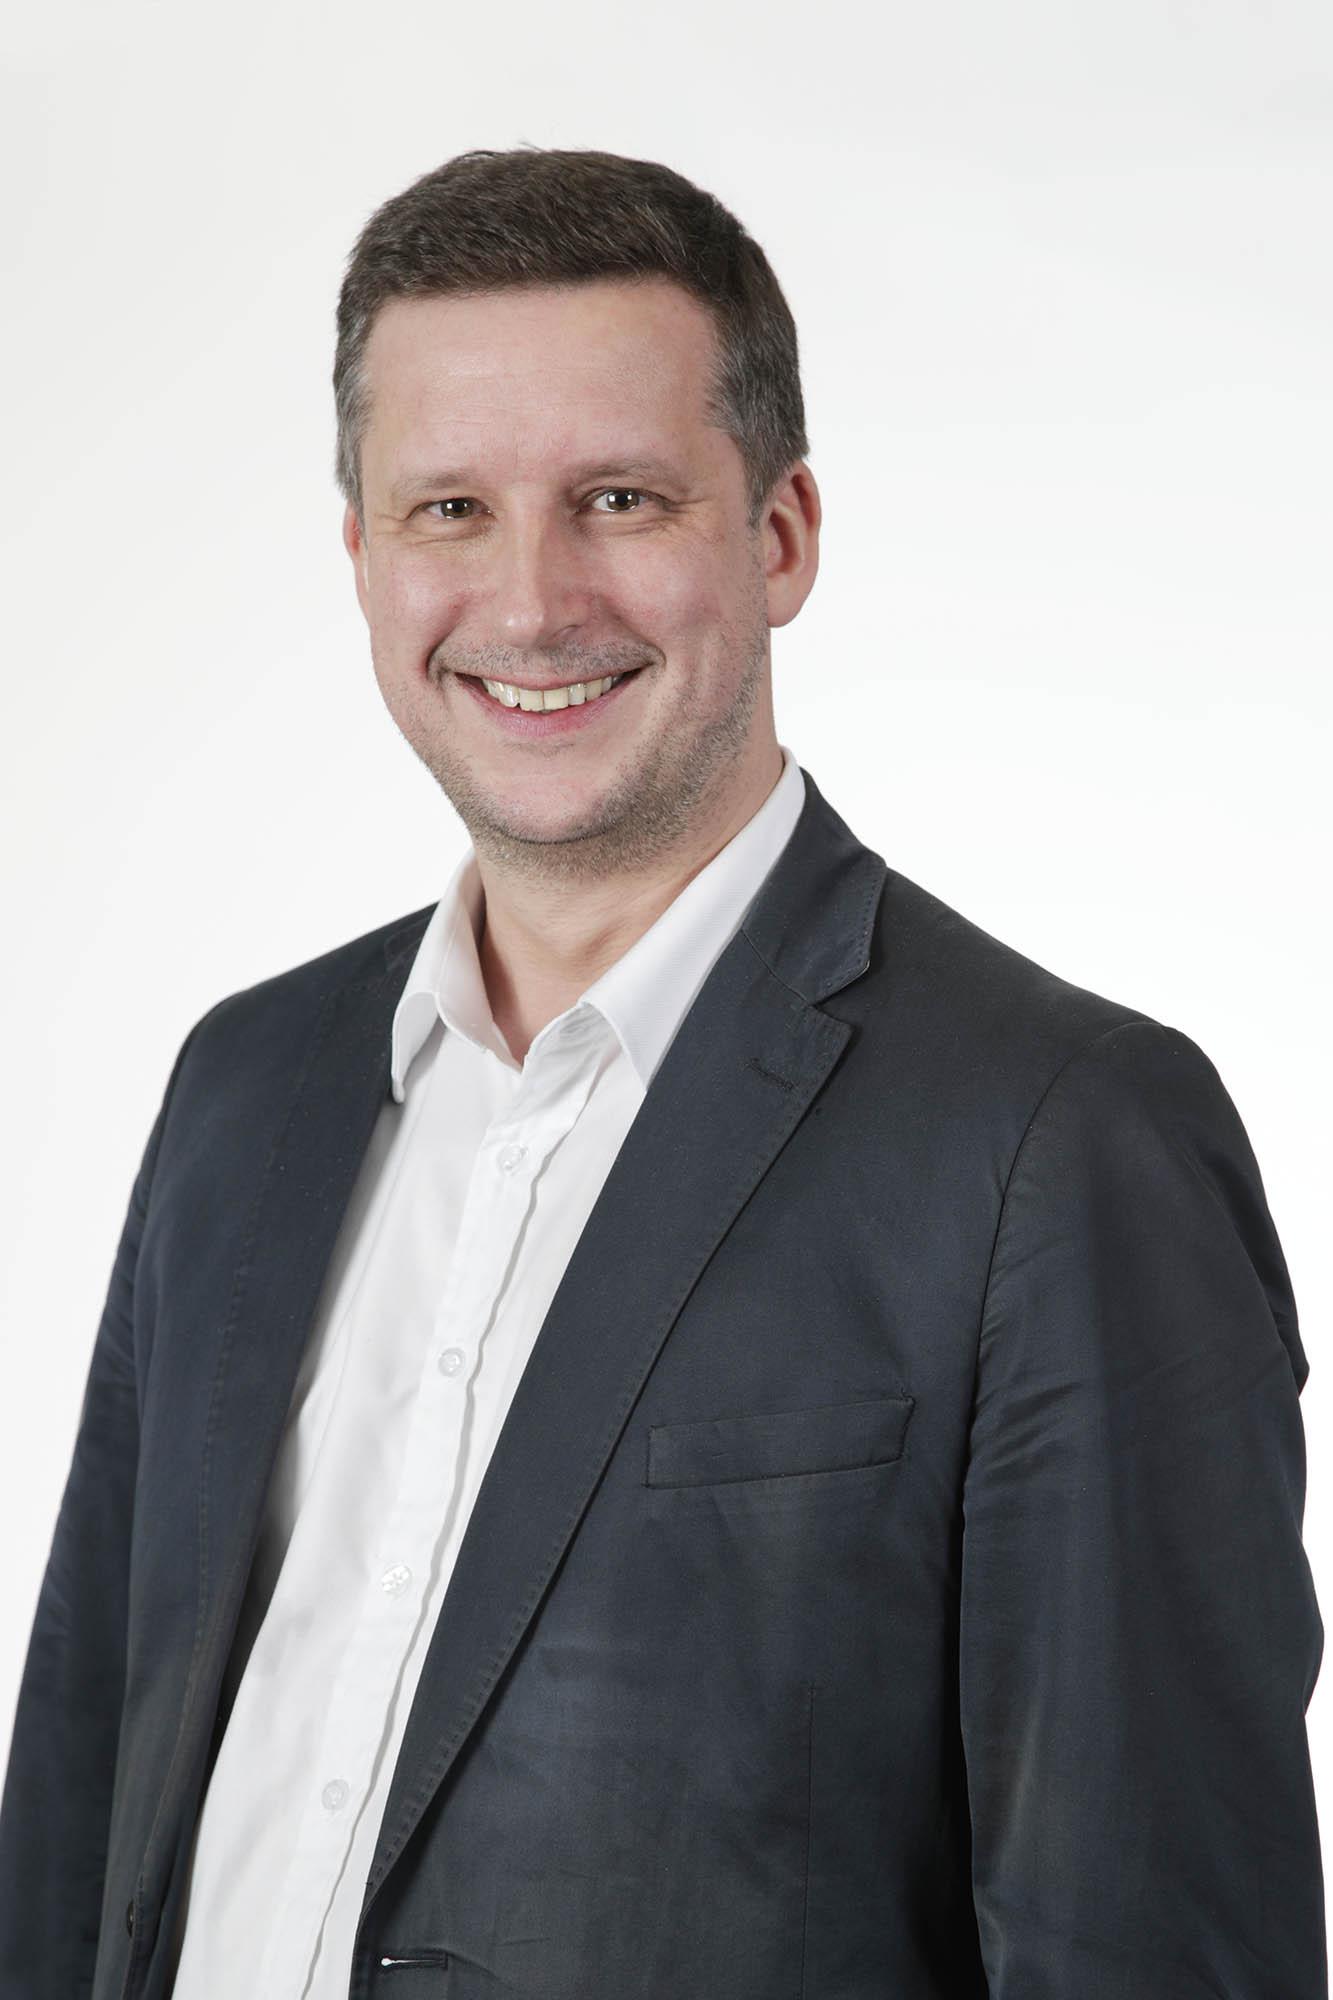 Kjell Erik Reinstad